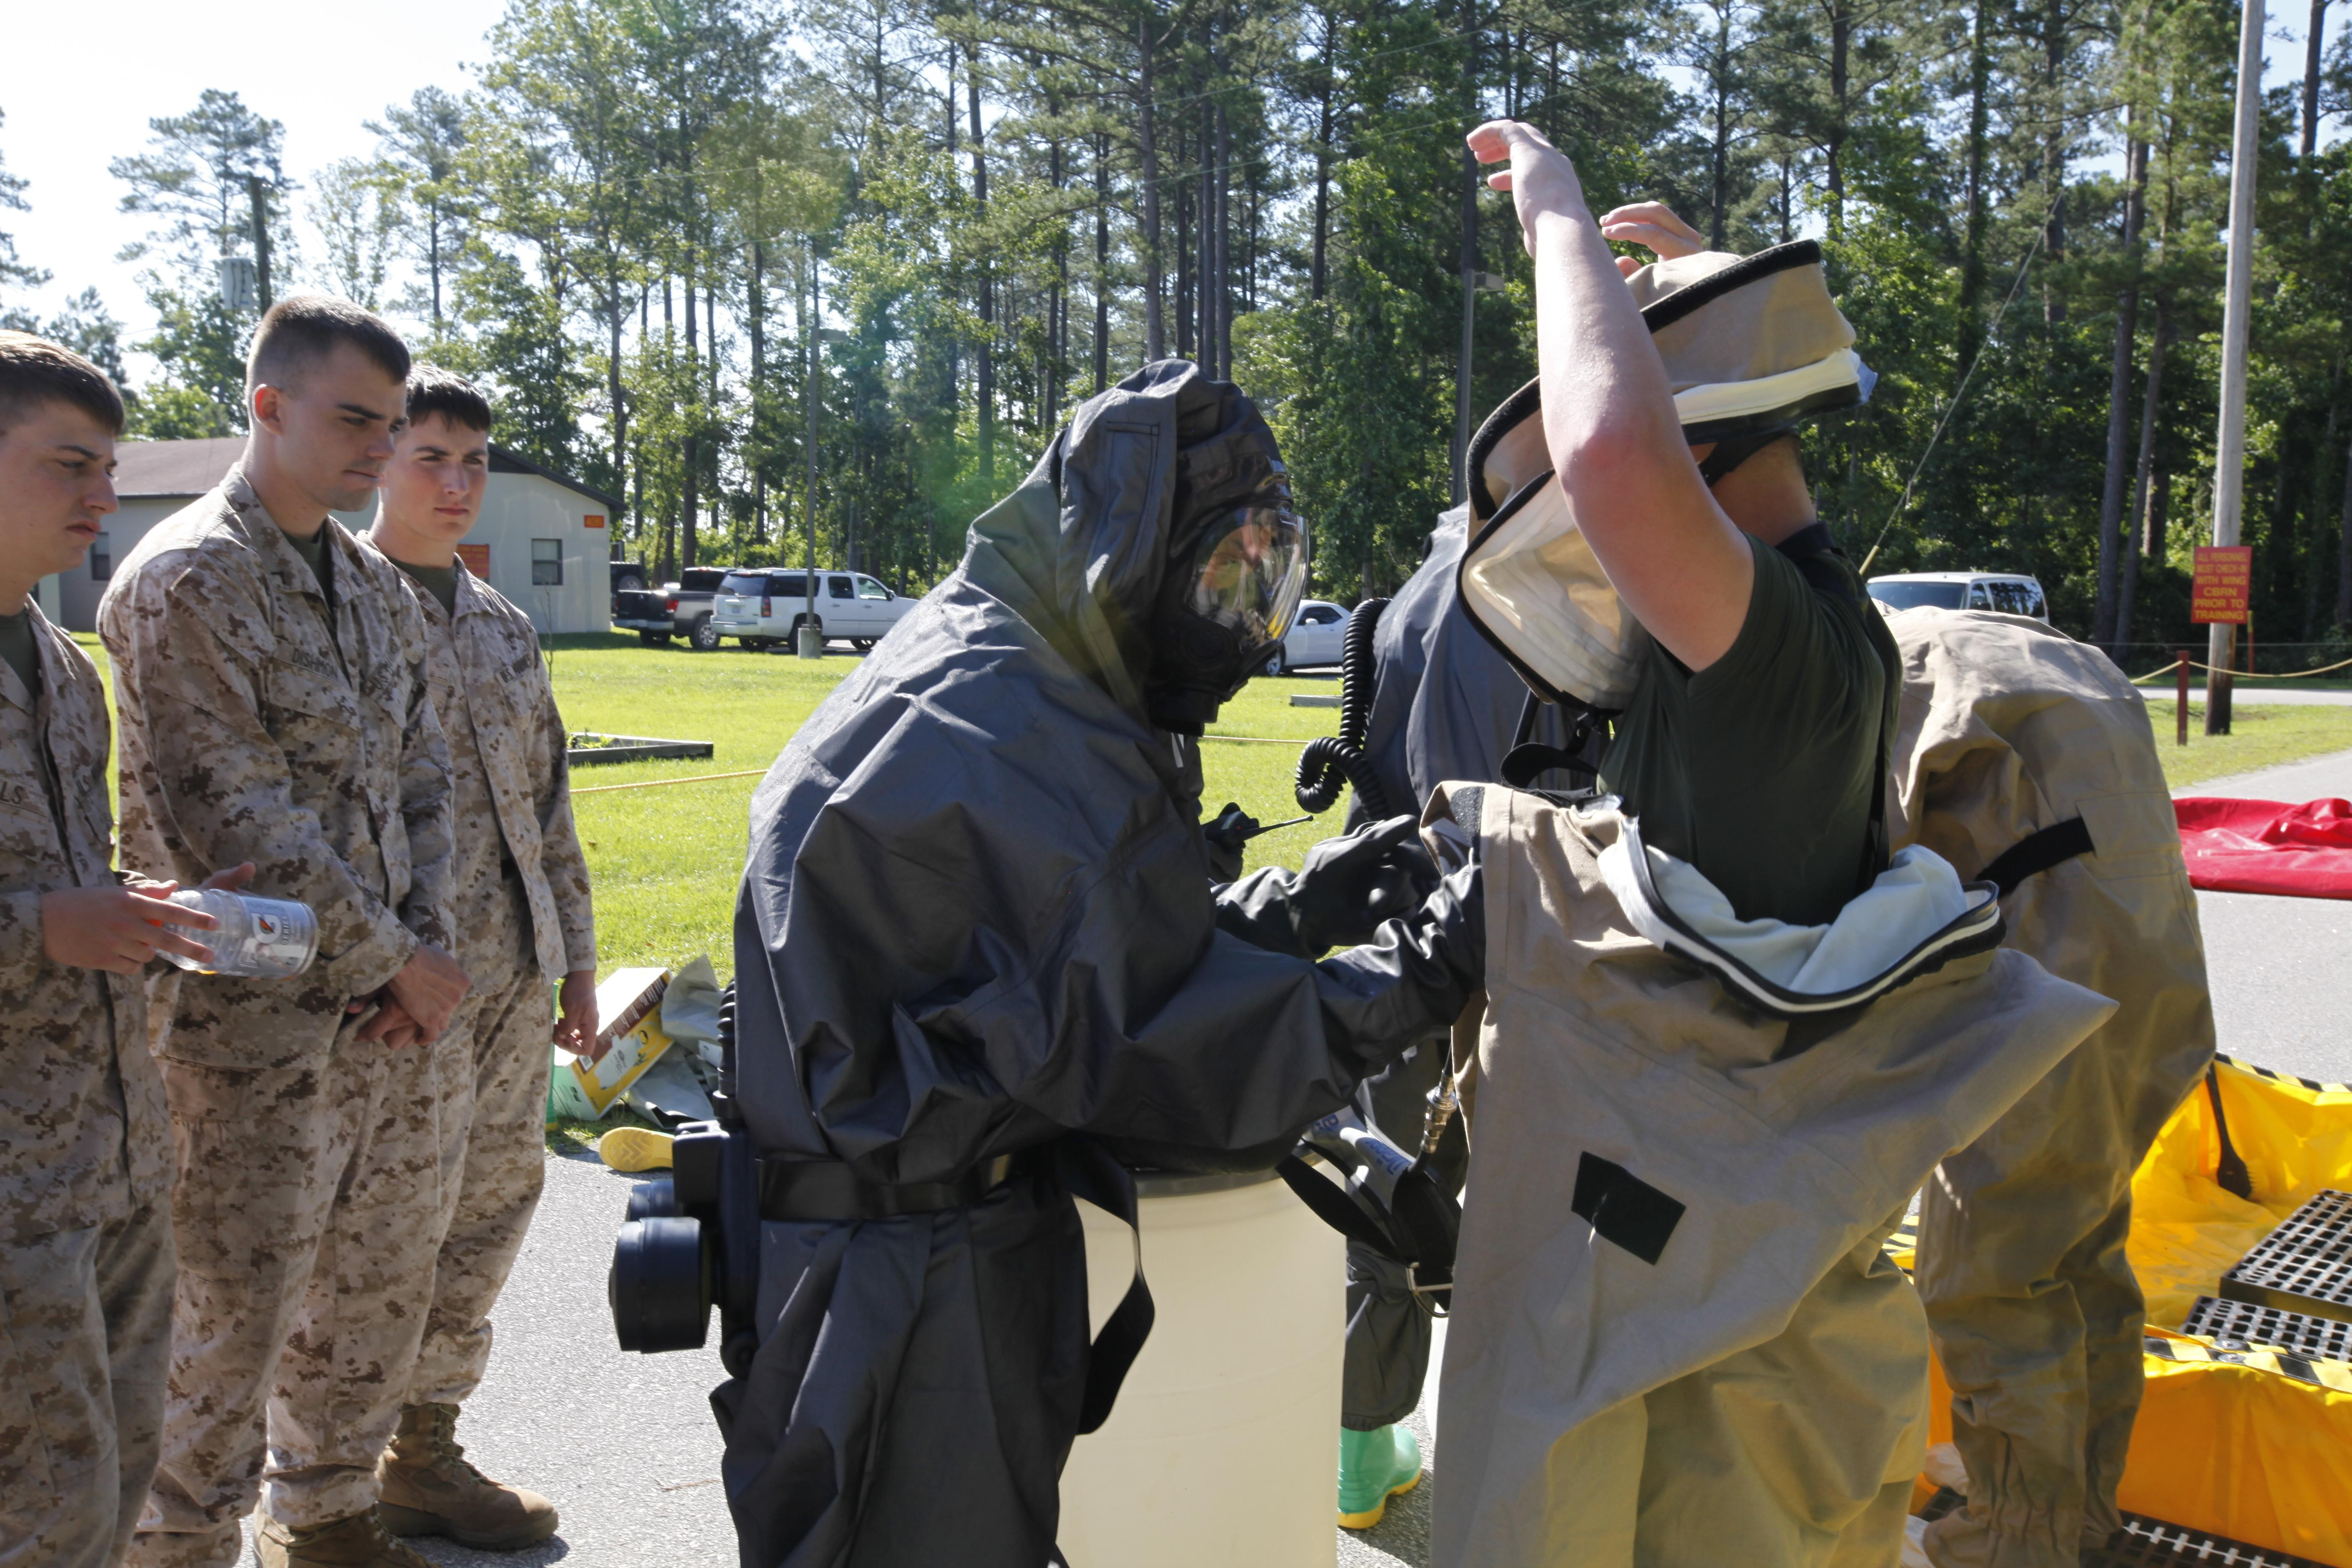 CBRN Marines respond to chemical warfare threat > Marine